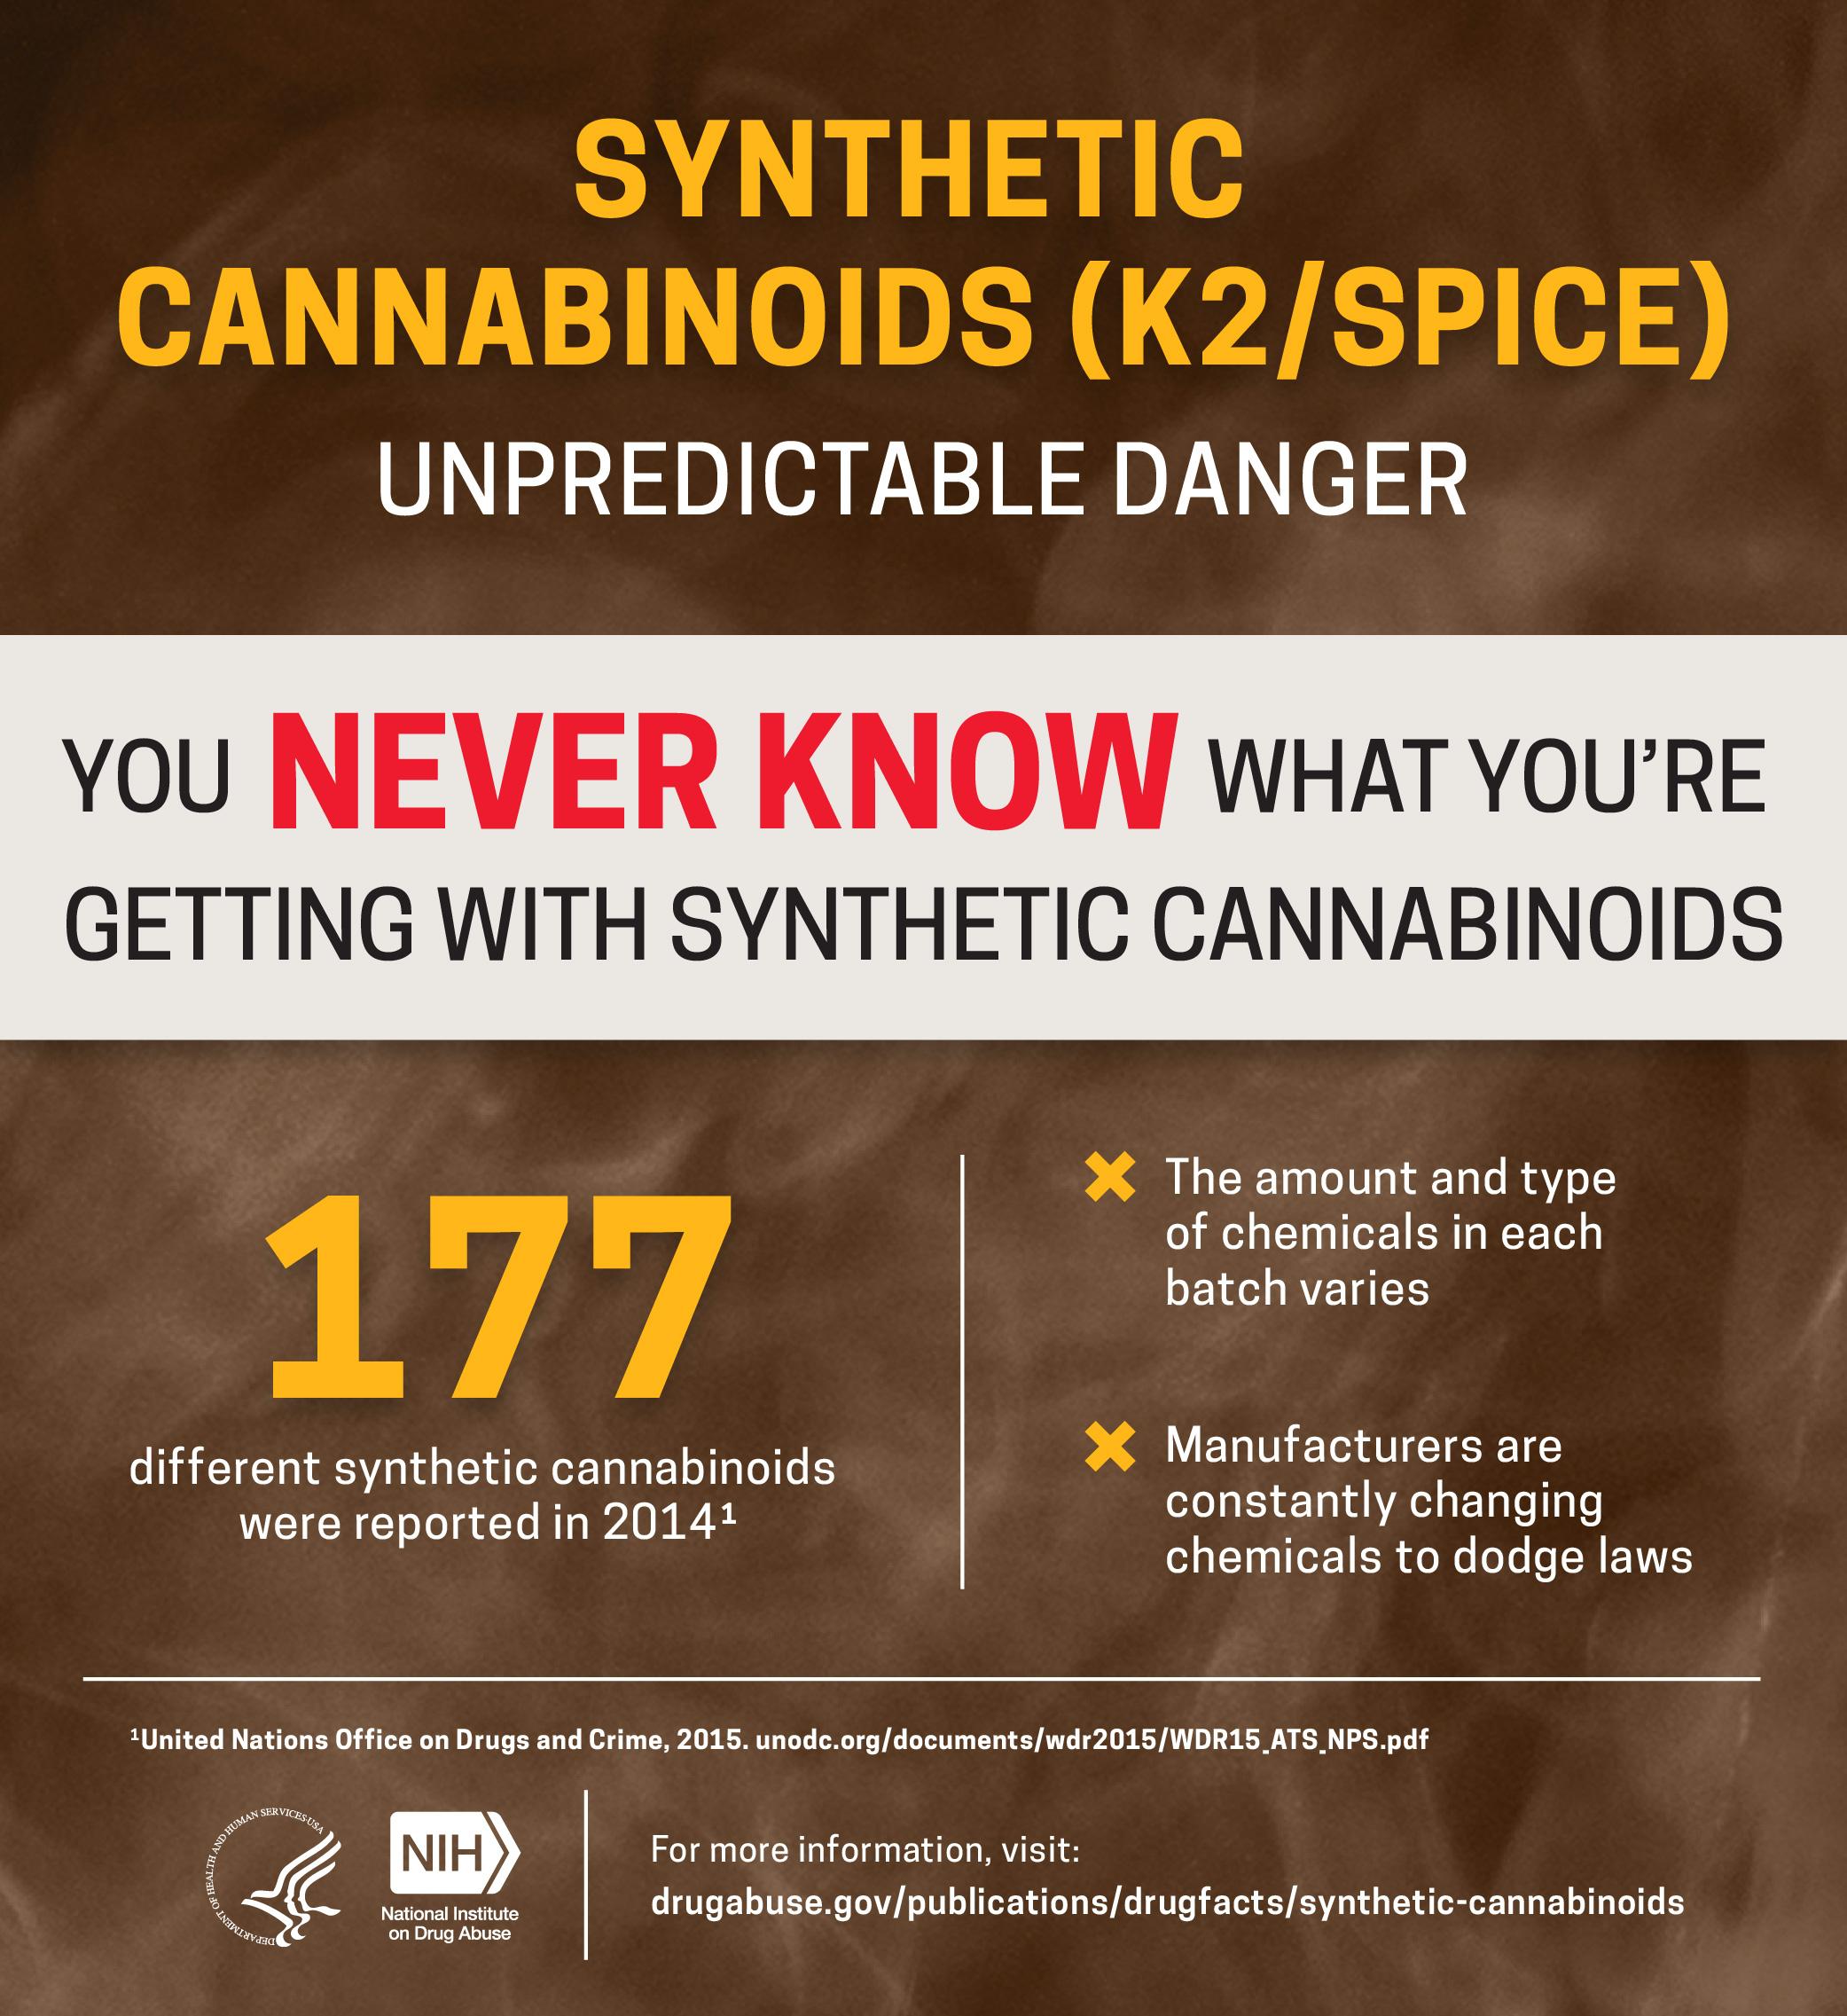 Synthetic Cannabinoids K2 Spice Unpredictable Danger